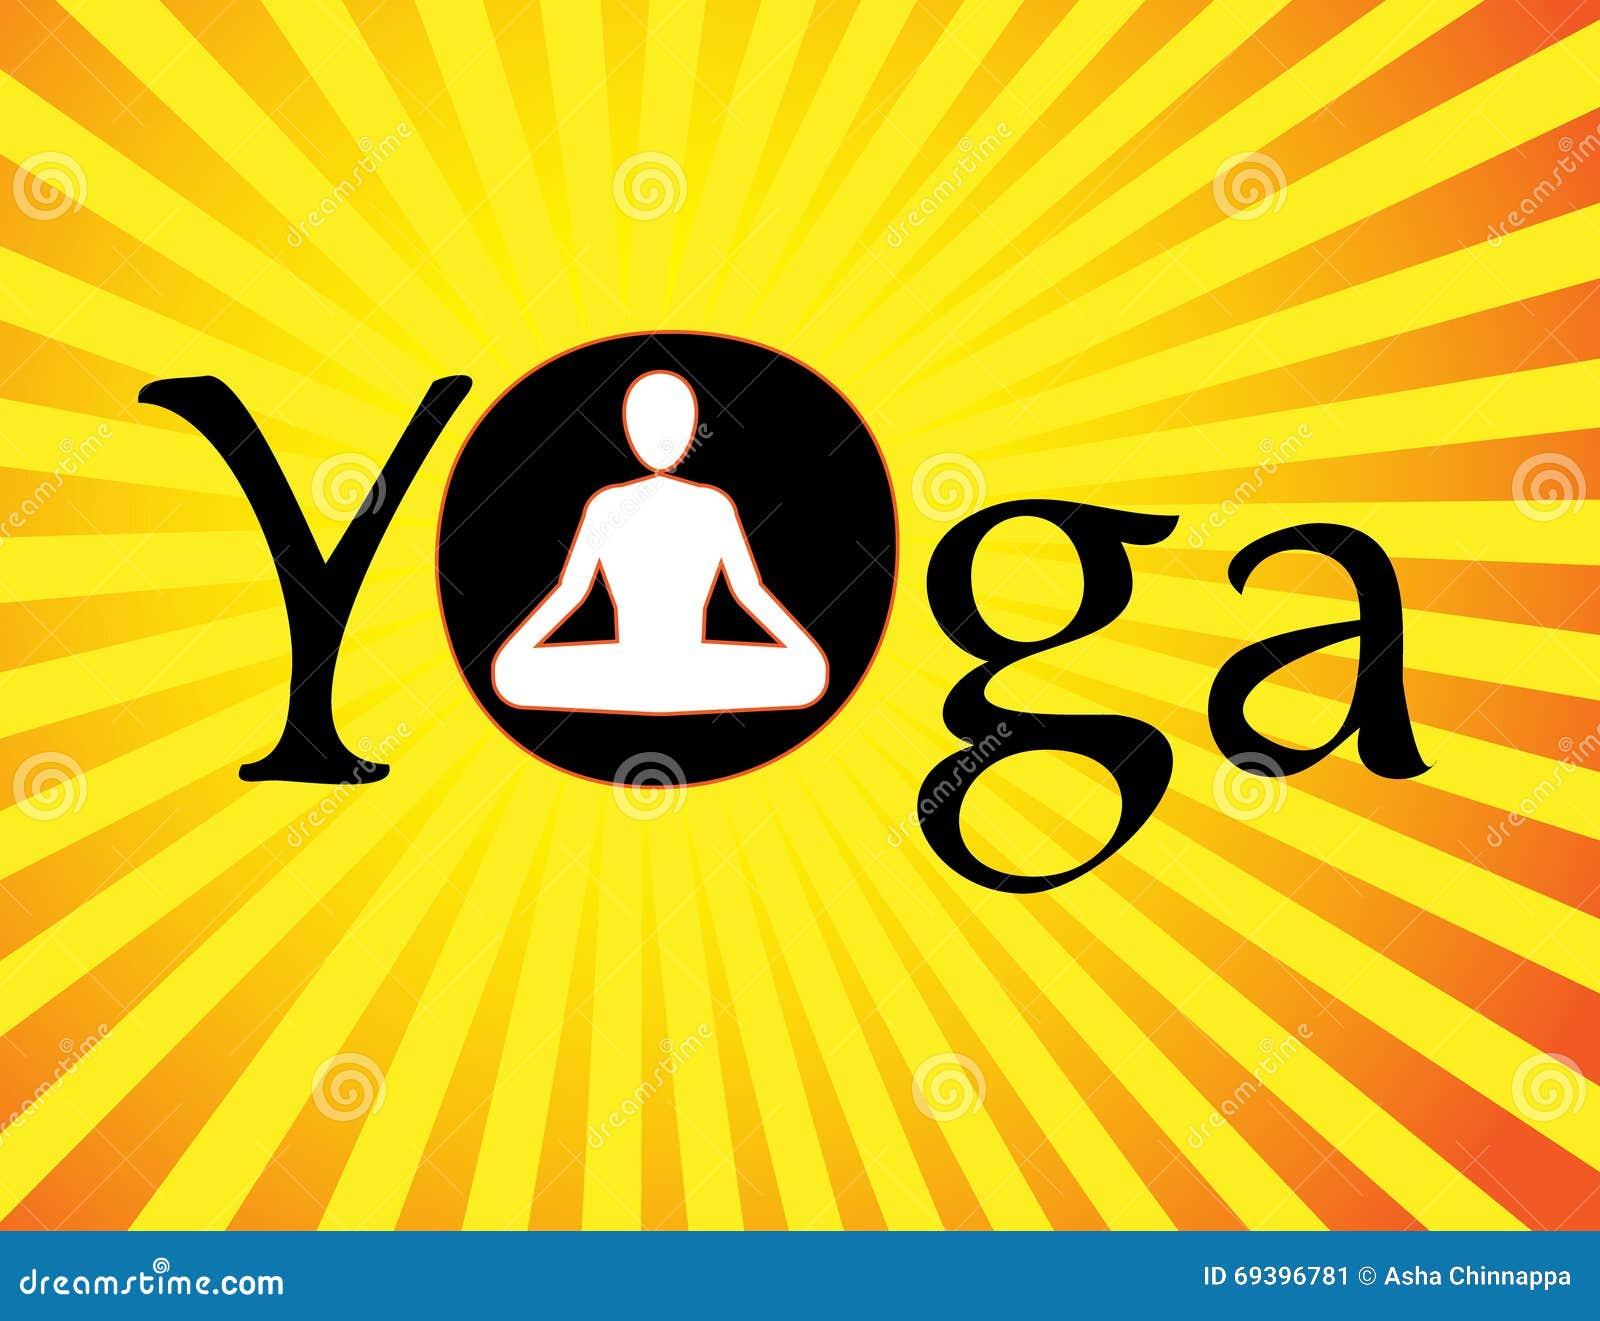 Vector Yoga Logo Symbol Man Performing In Lotus Position Asana Meditation Illustration 69396781